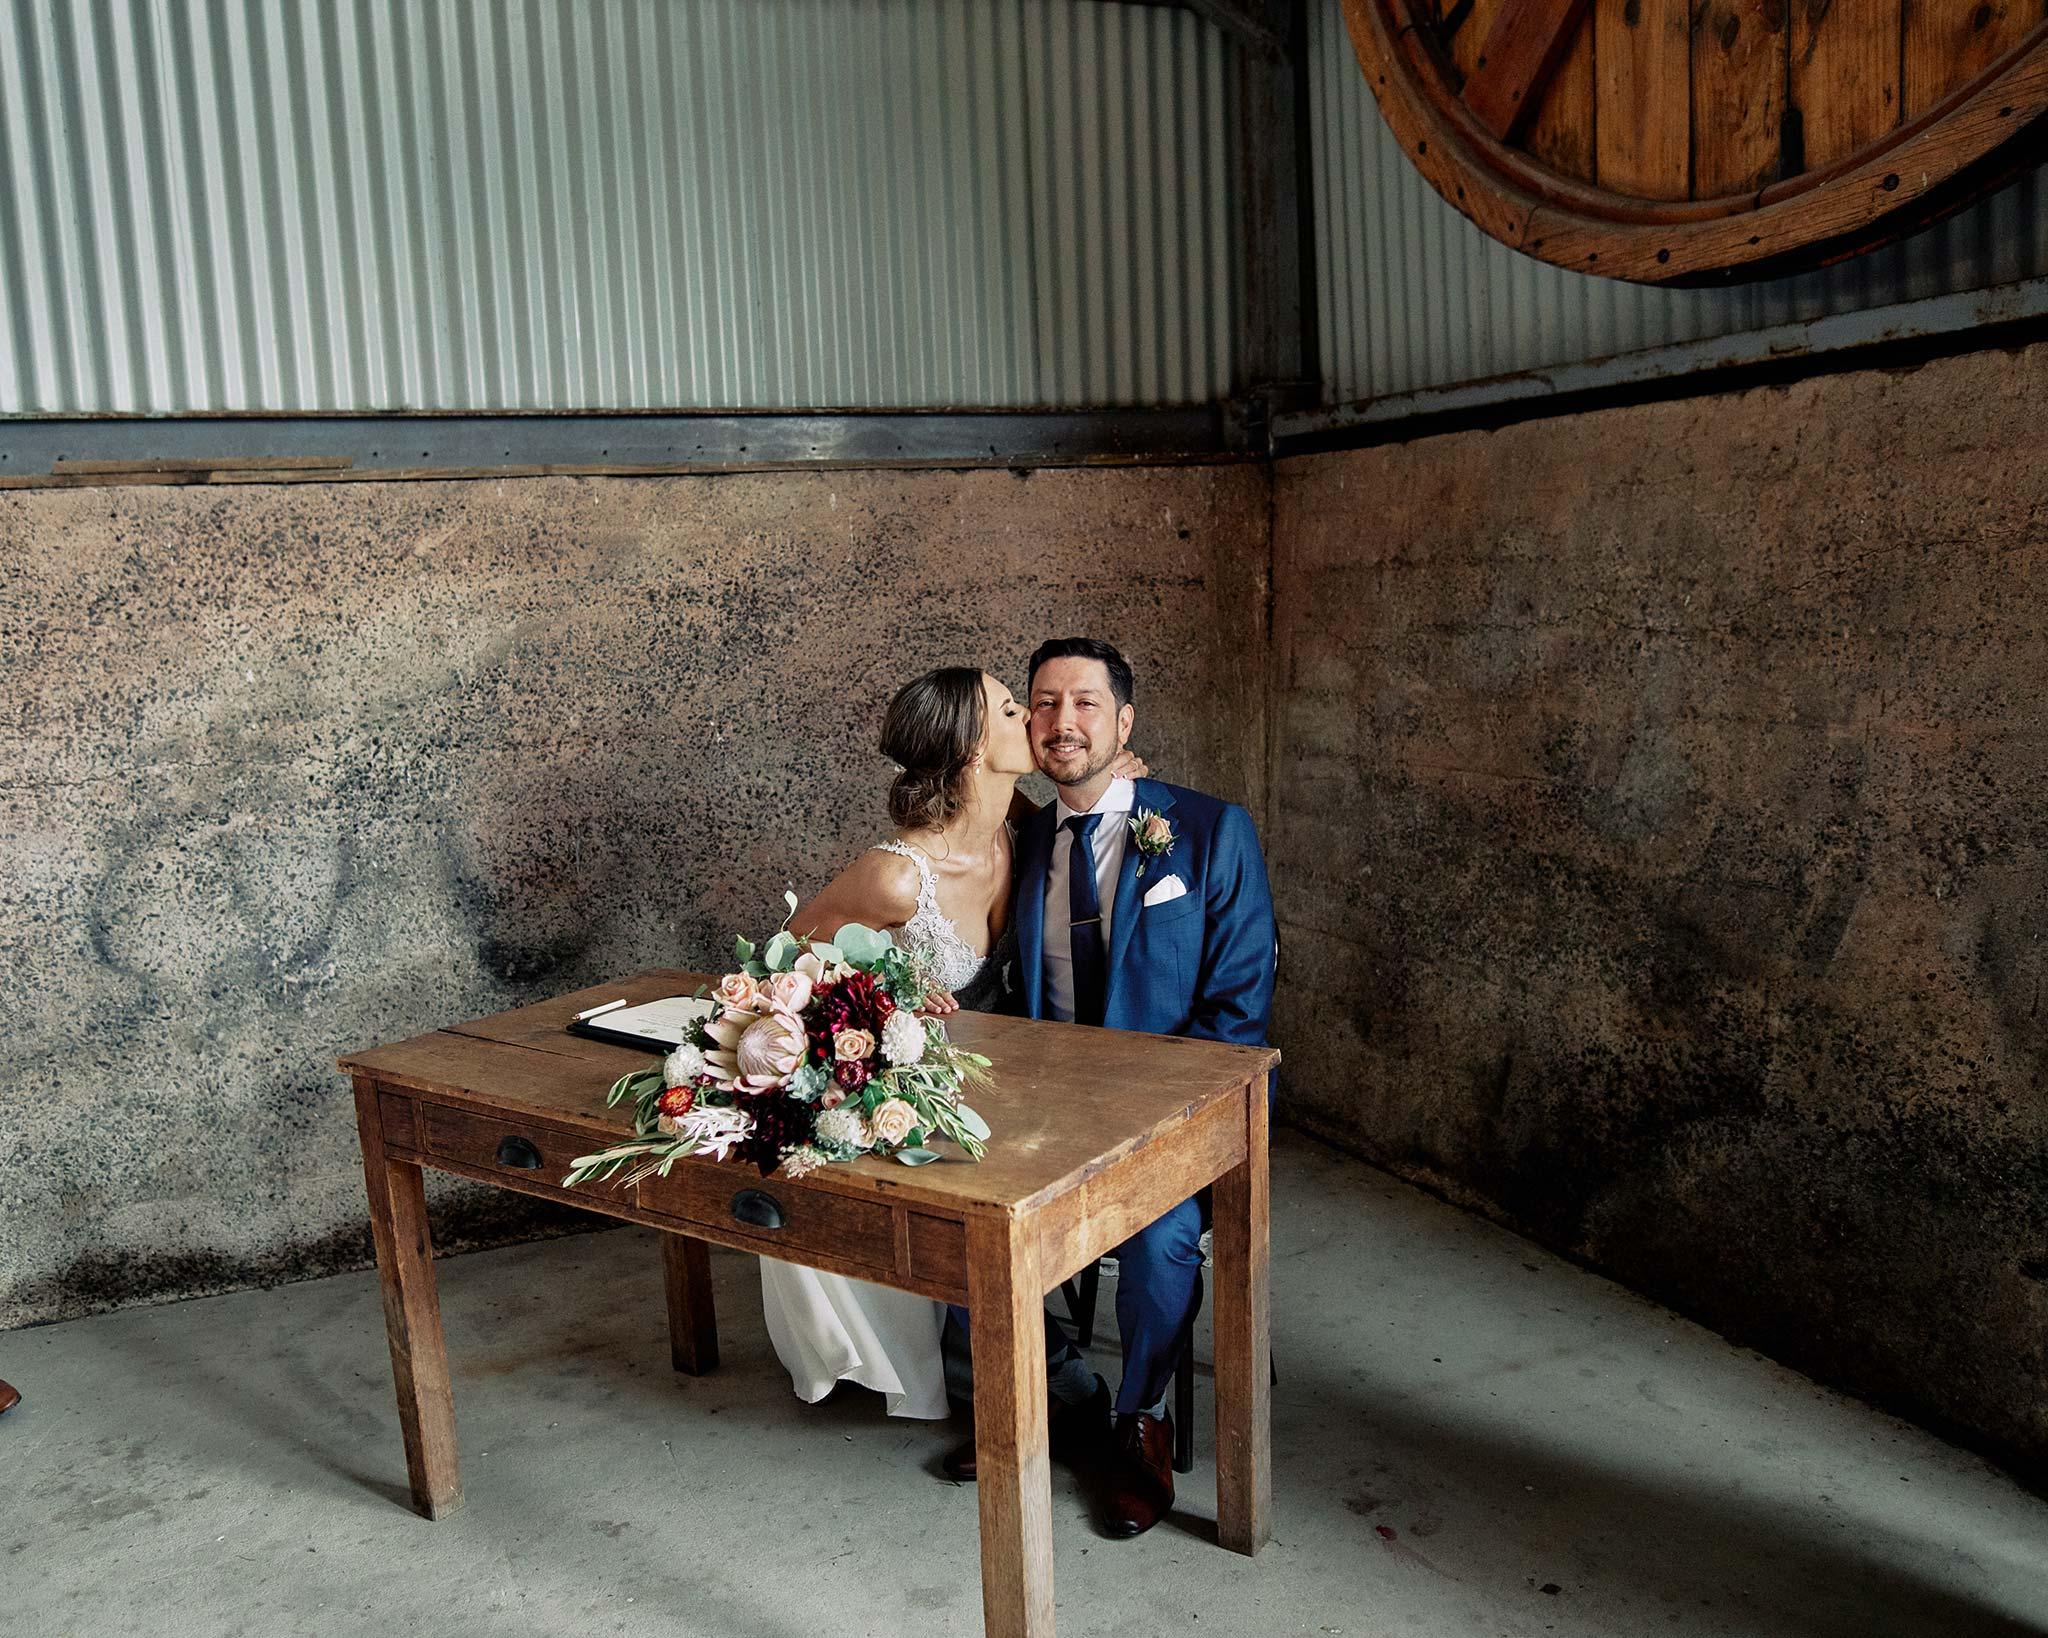 Zonzo estate wedding signing of paper kiss